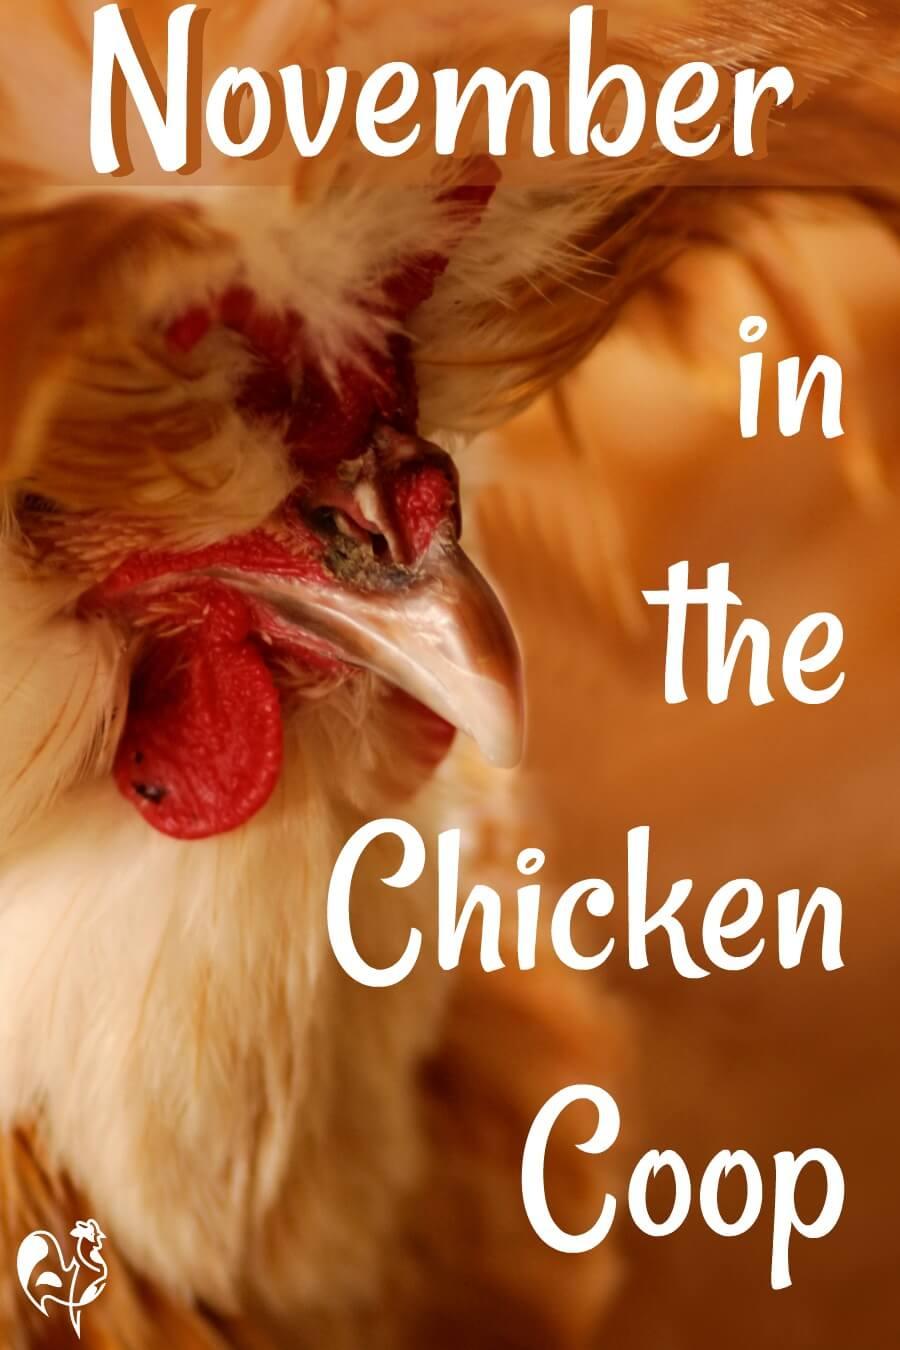 Raising chickens in November - 20 tasks. Pin for later.